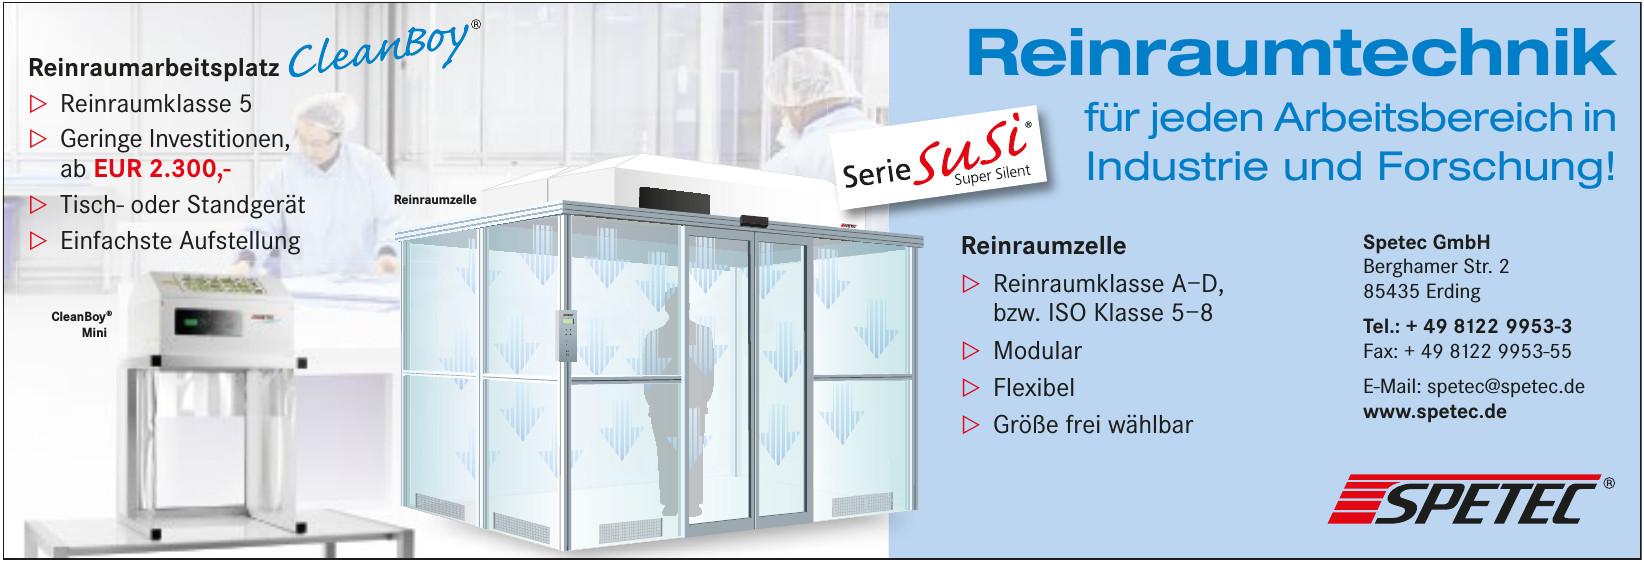 Spetec GmbH